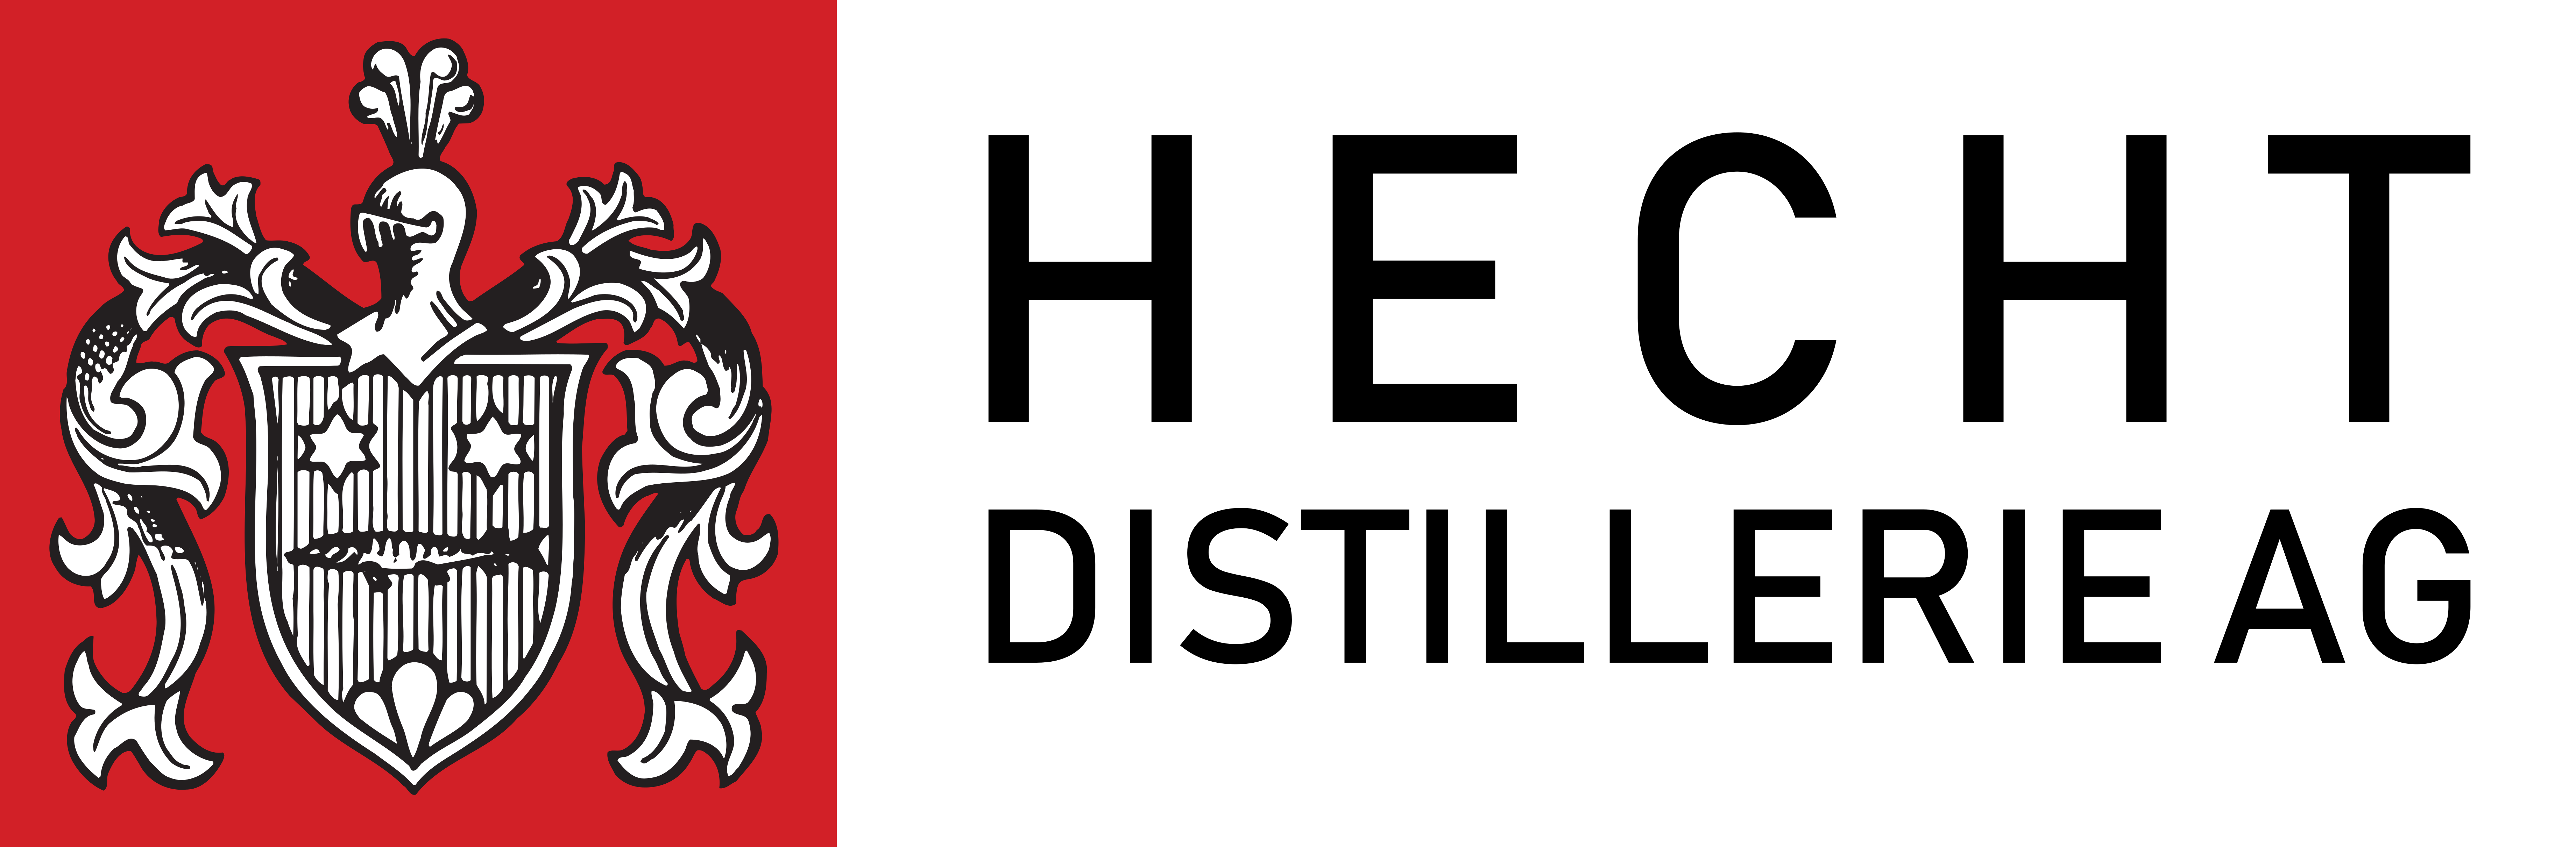 Hecht Distillerie AG